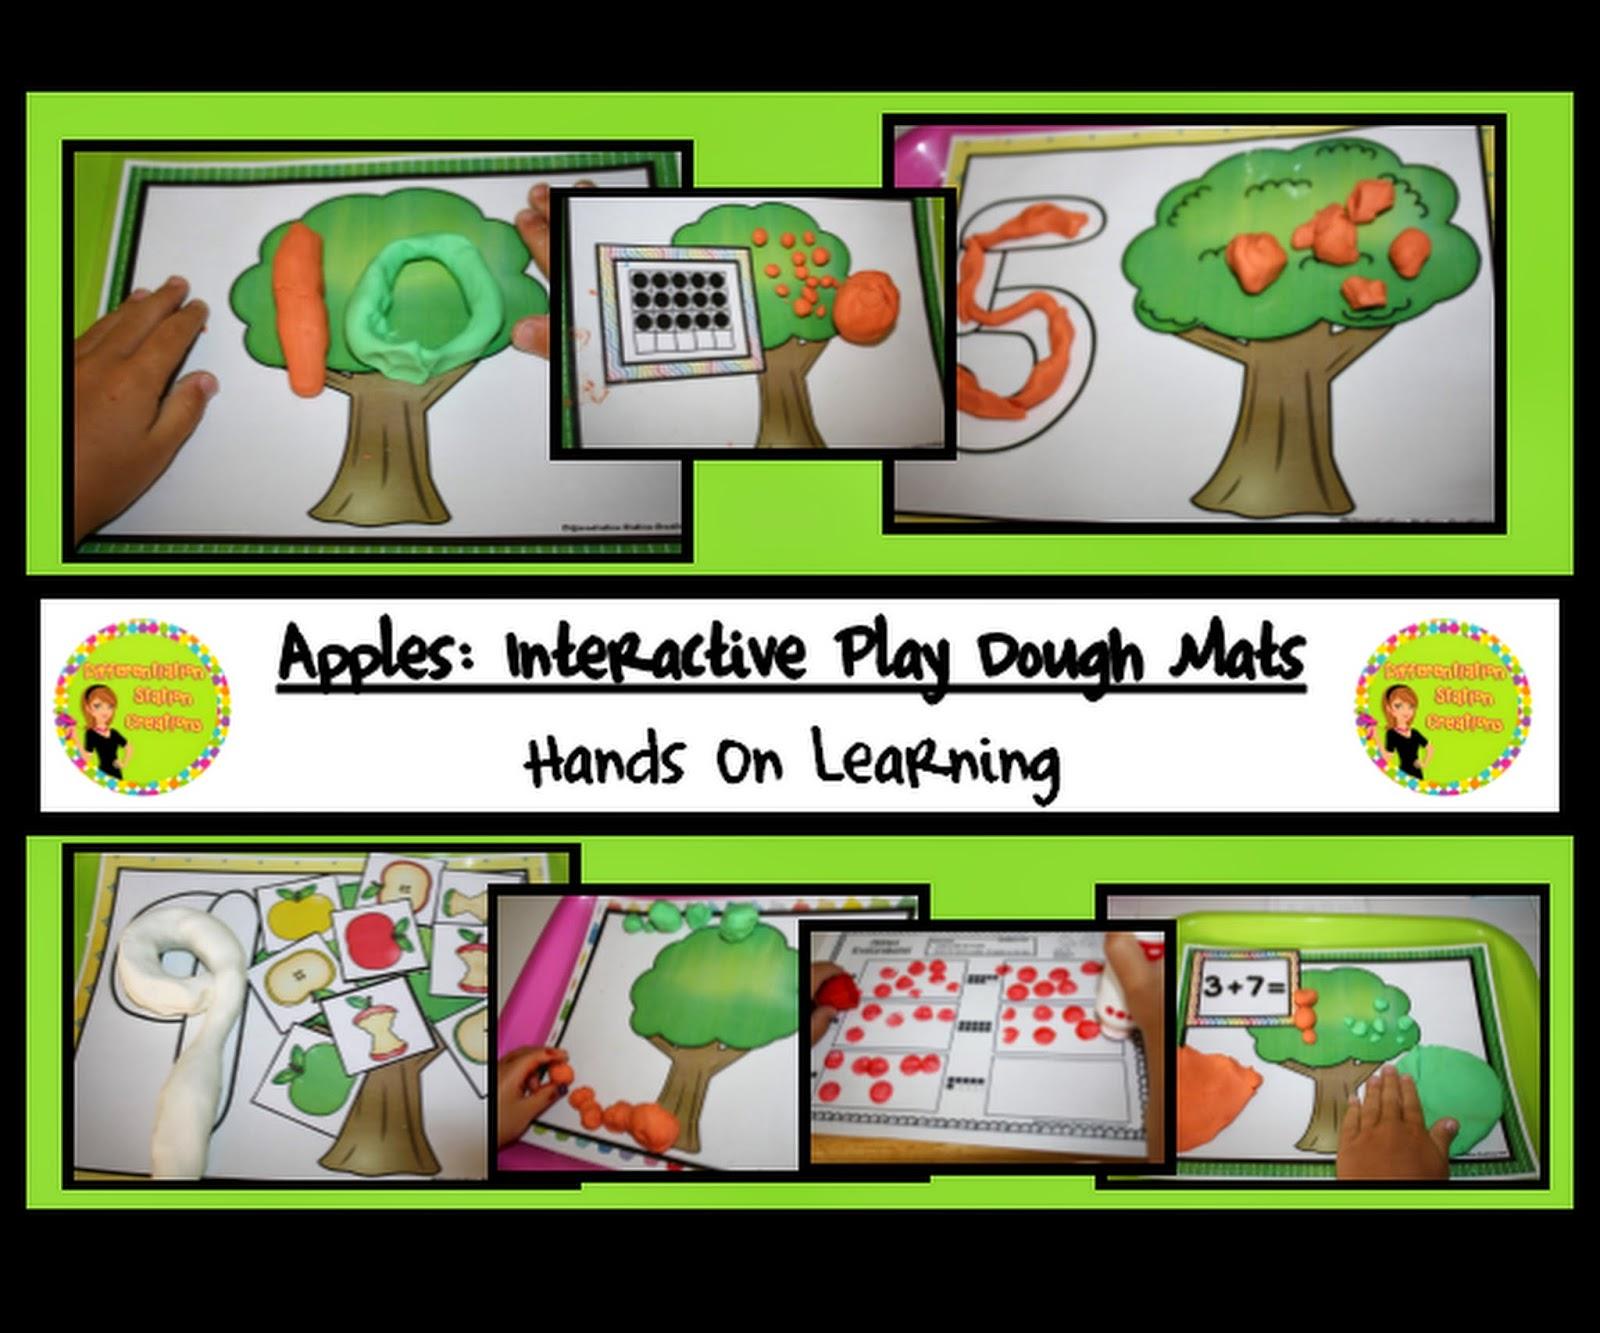 http://www.teacherspayteachers.com/Product/Apples-Interactive-Play-Dough-Mats-Counting-Centers-Printables-1353686